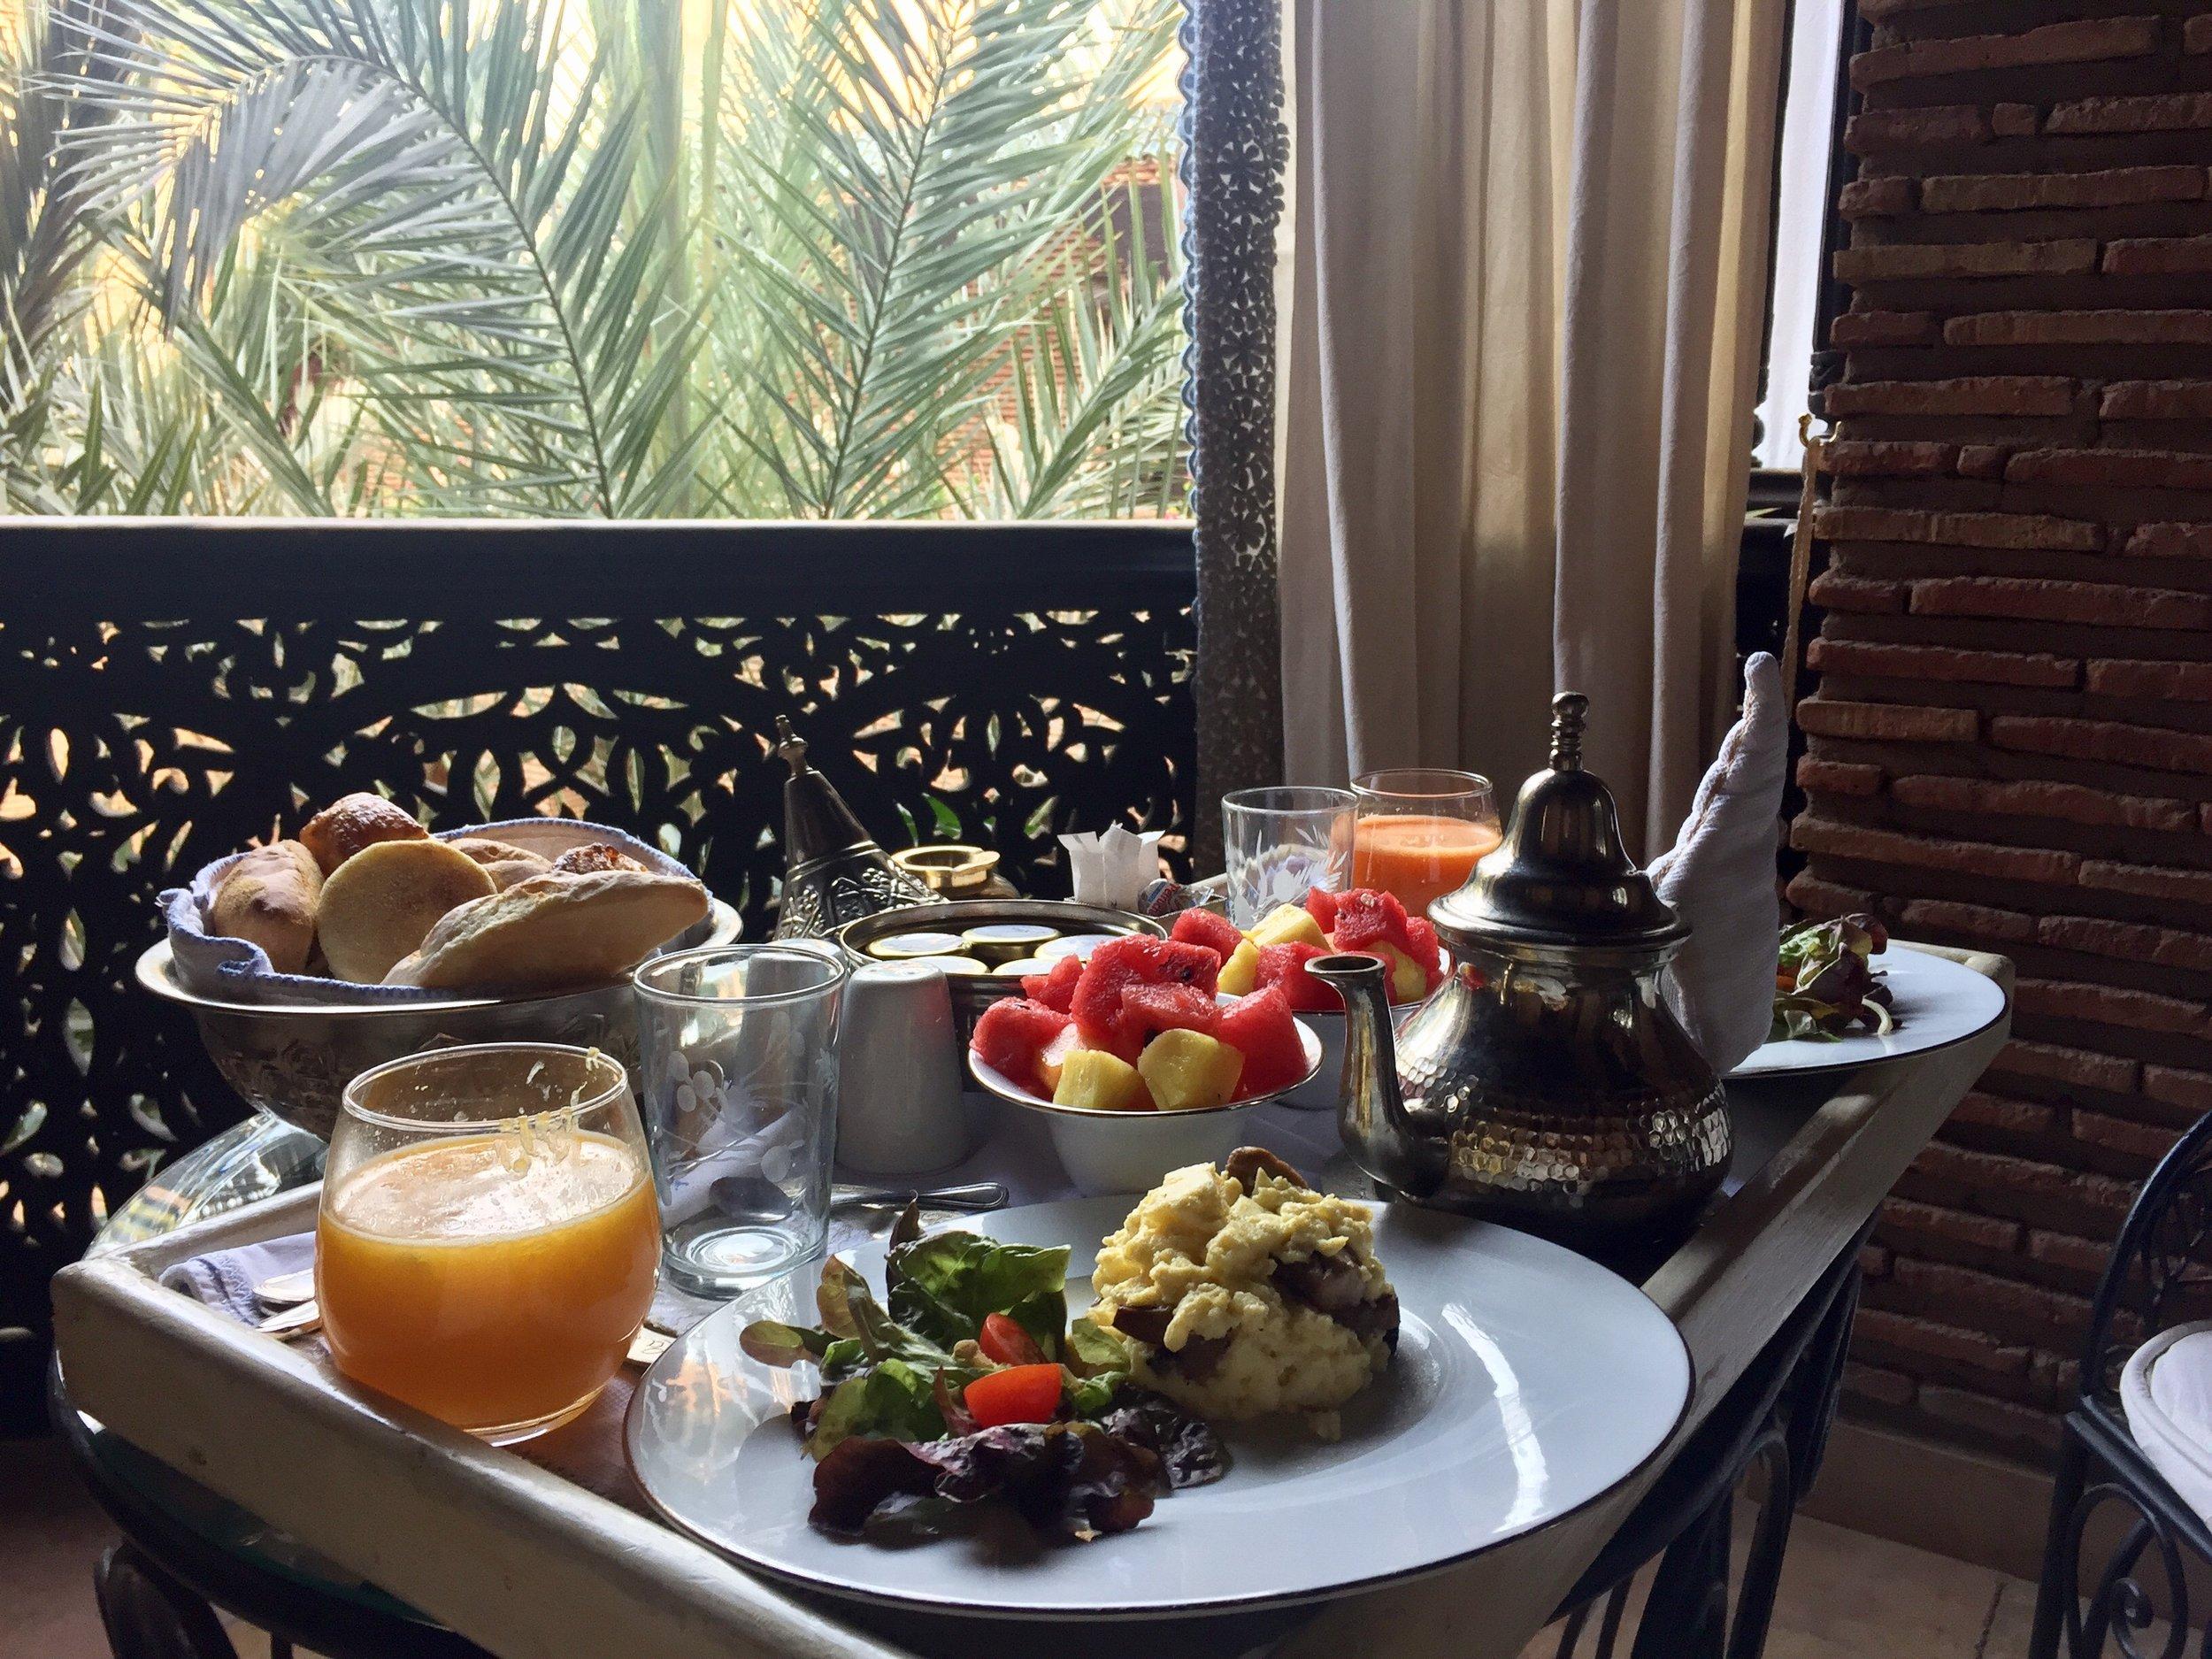 Petit déjeuner servi en chambre